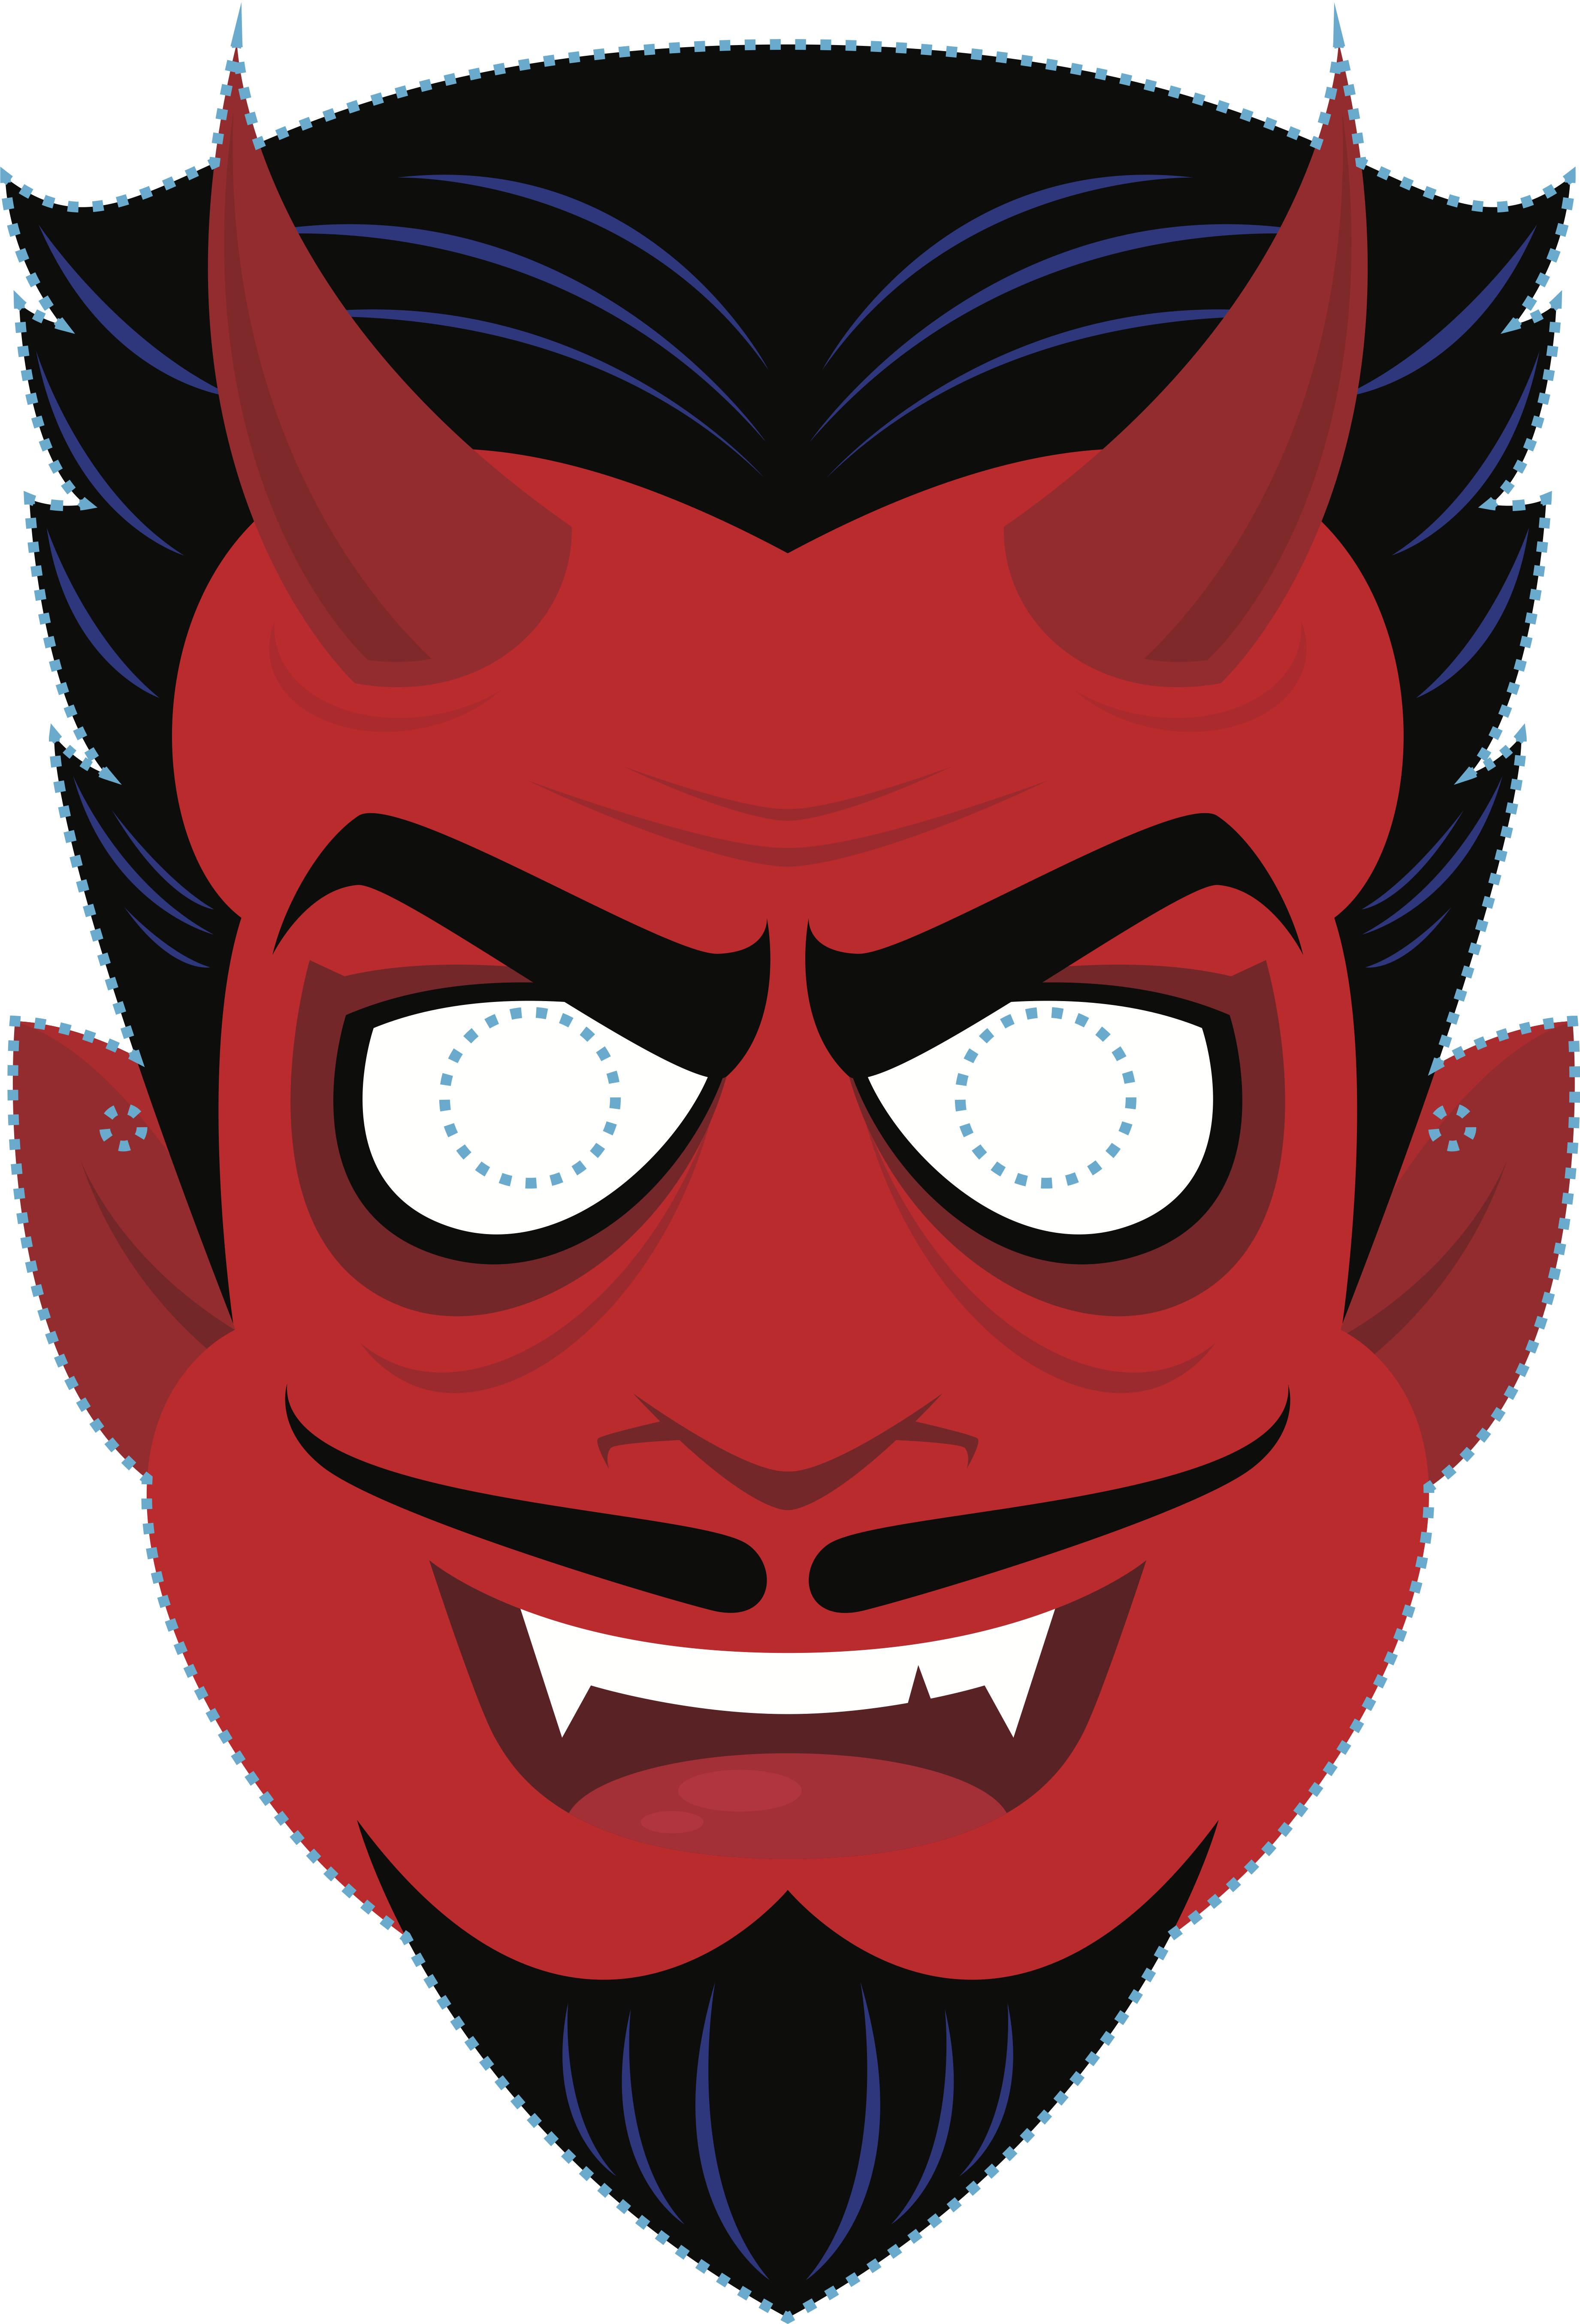 Printable Halloween Masks | Printable Halloween Masks | Printable - Free Printable Halloween Face Masks